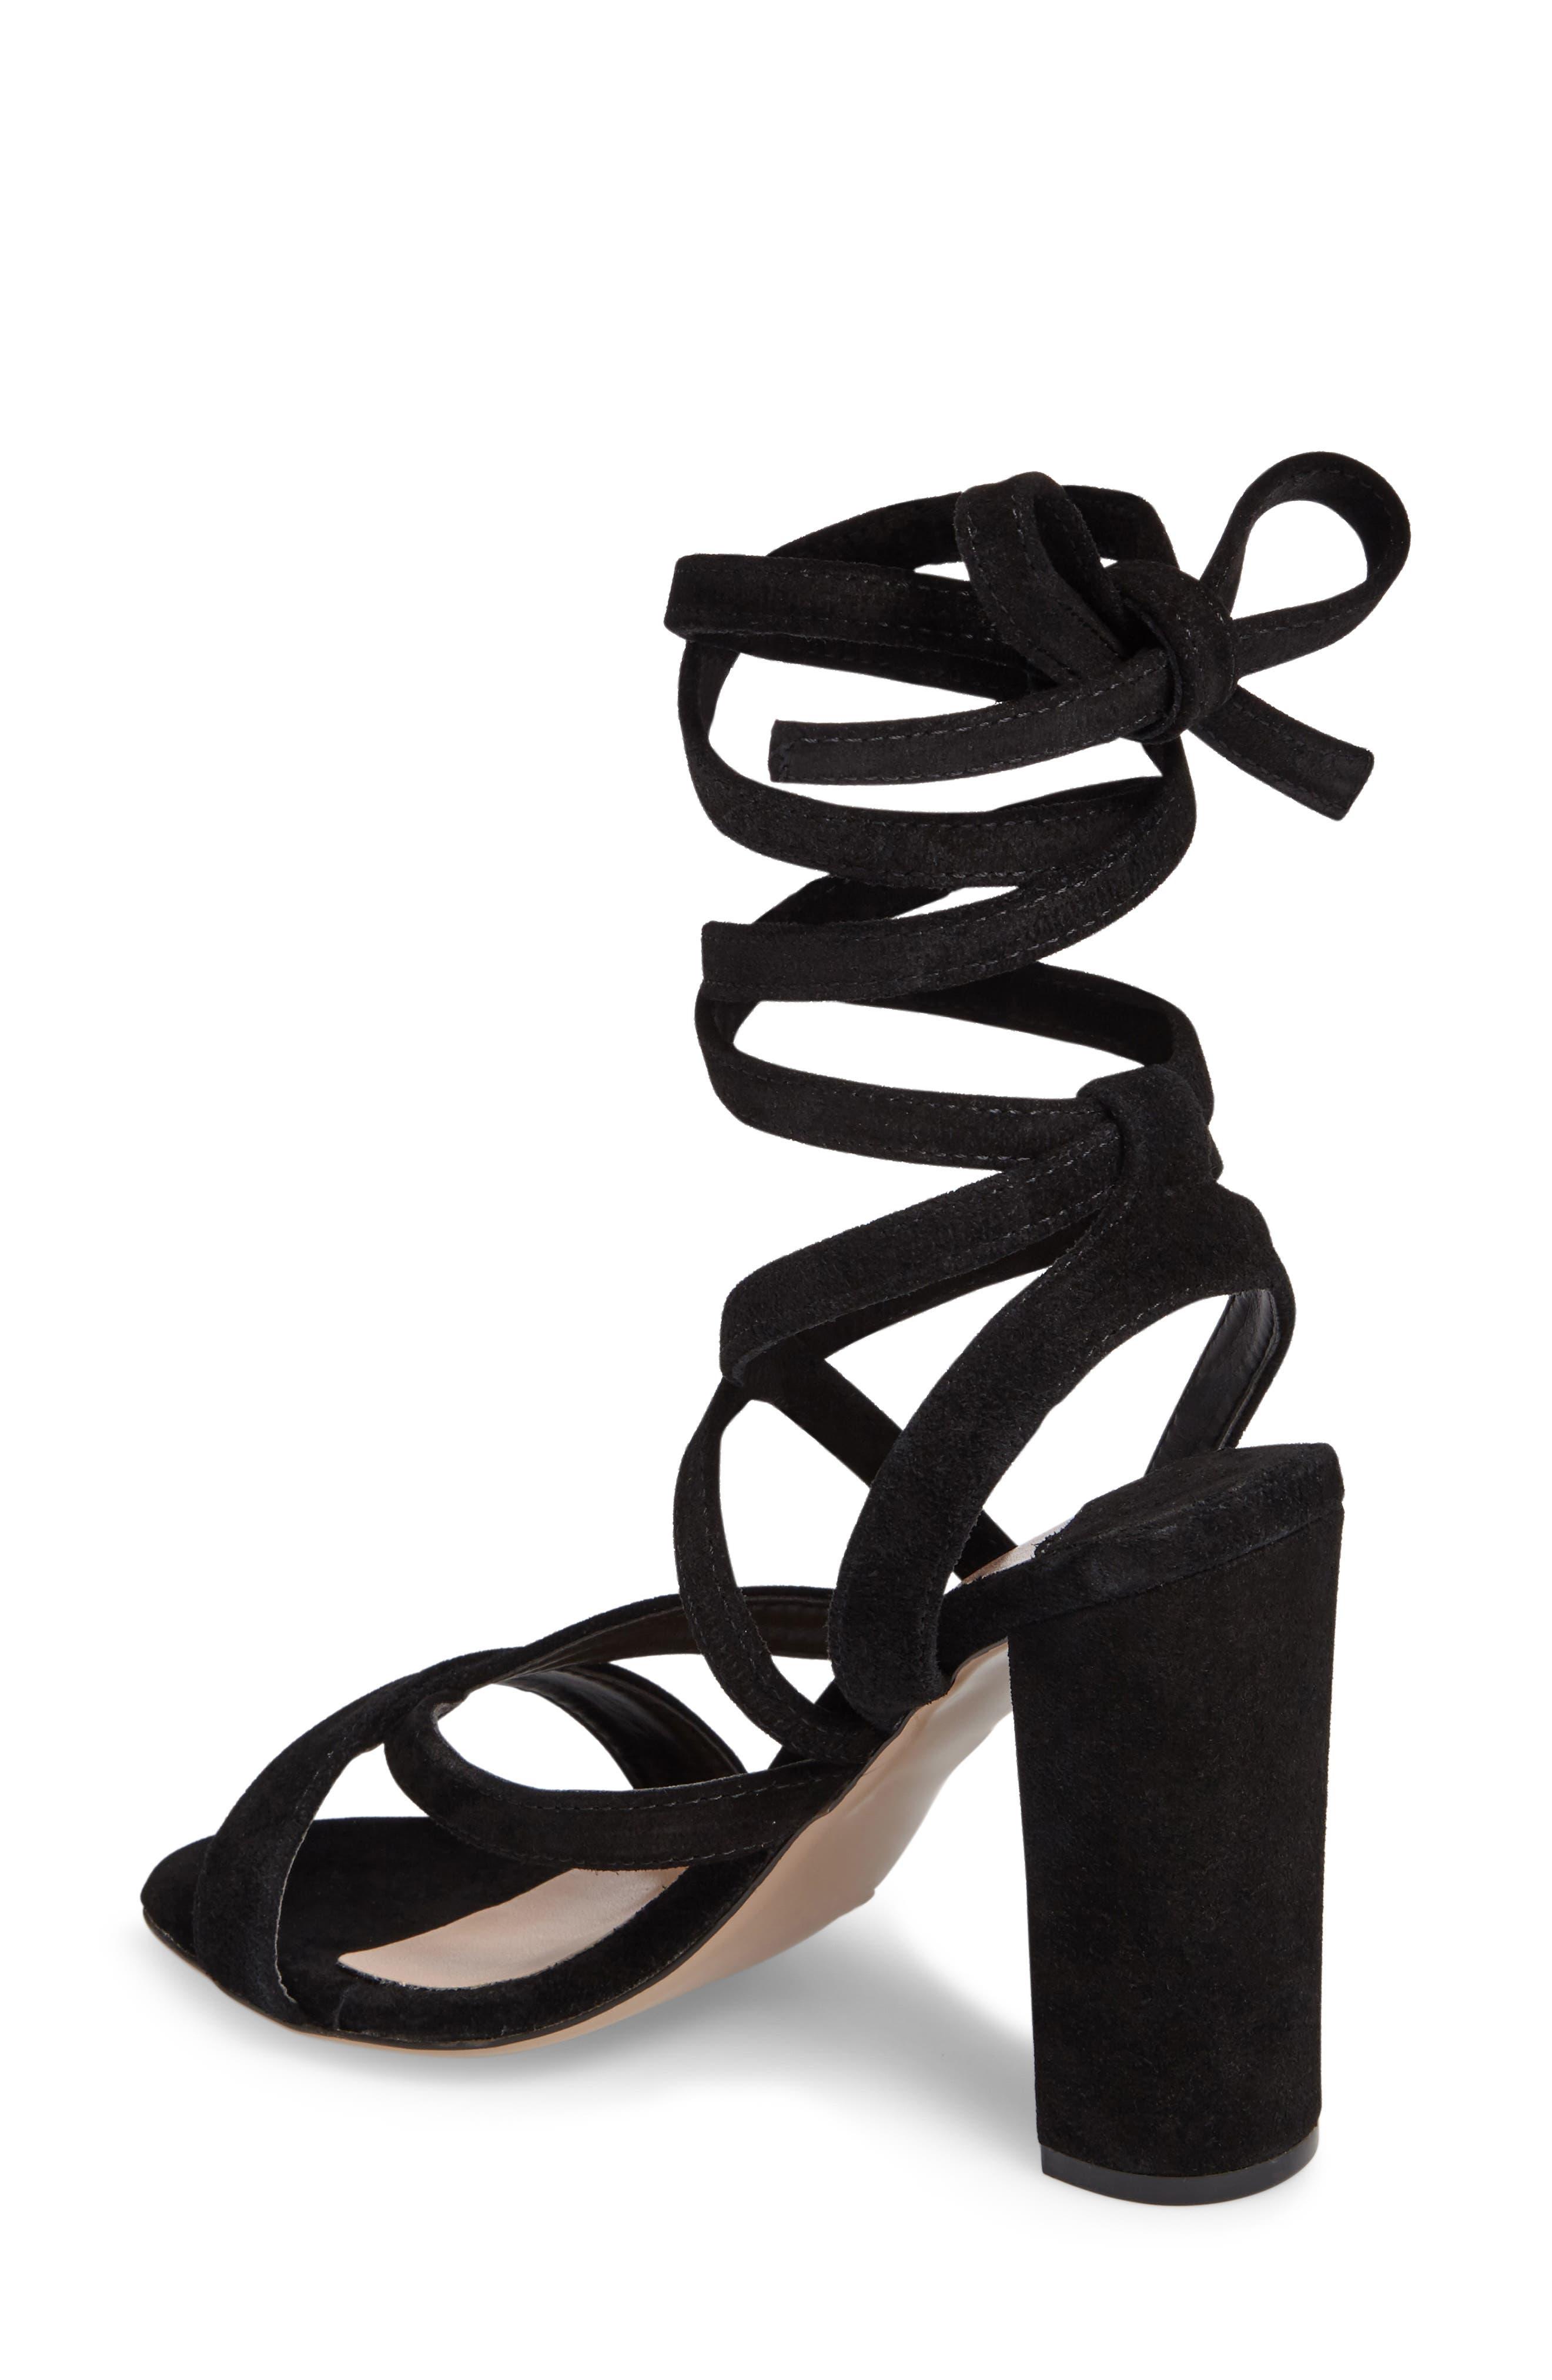 Kappa Ankle Wrap Sandal,                             Alternate thumbnail 2, color,                             001